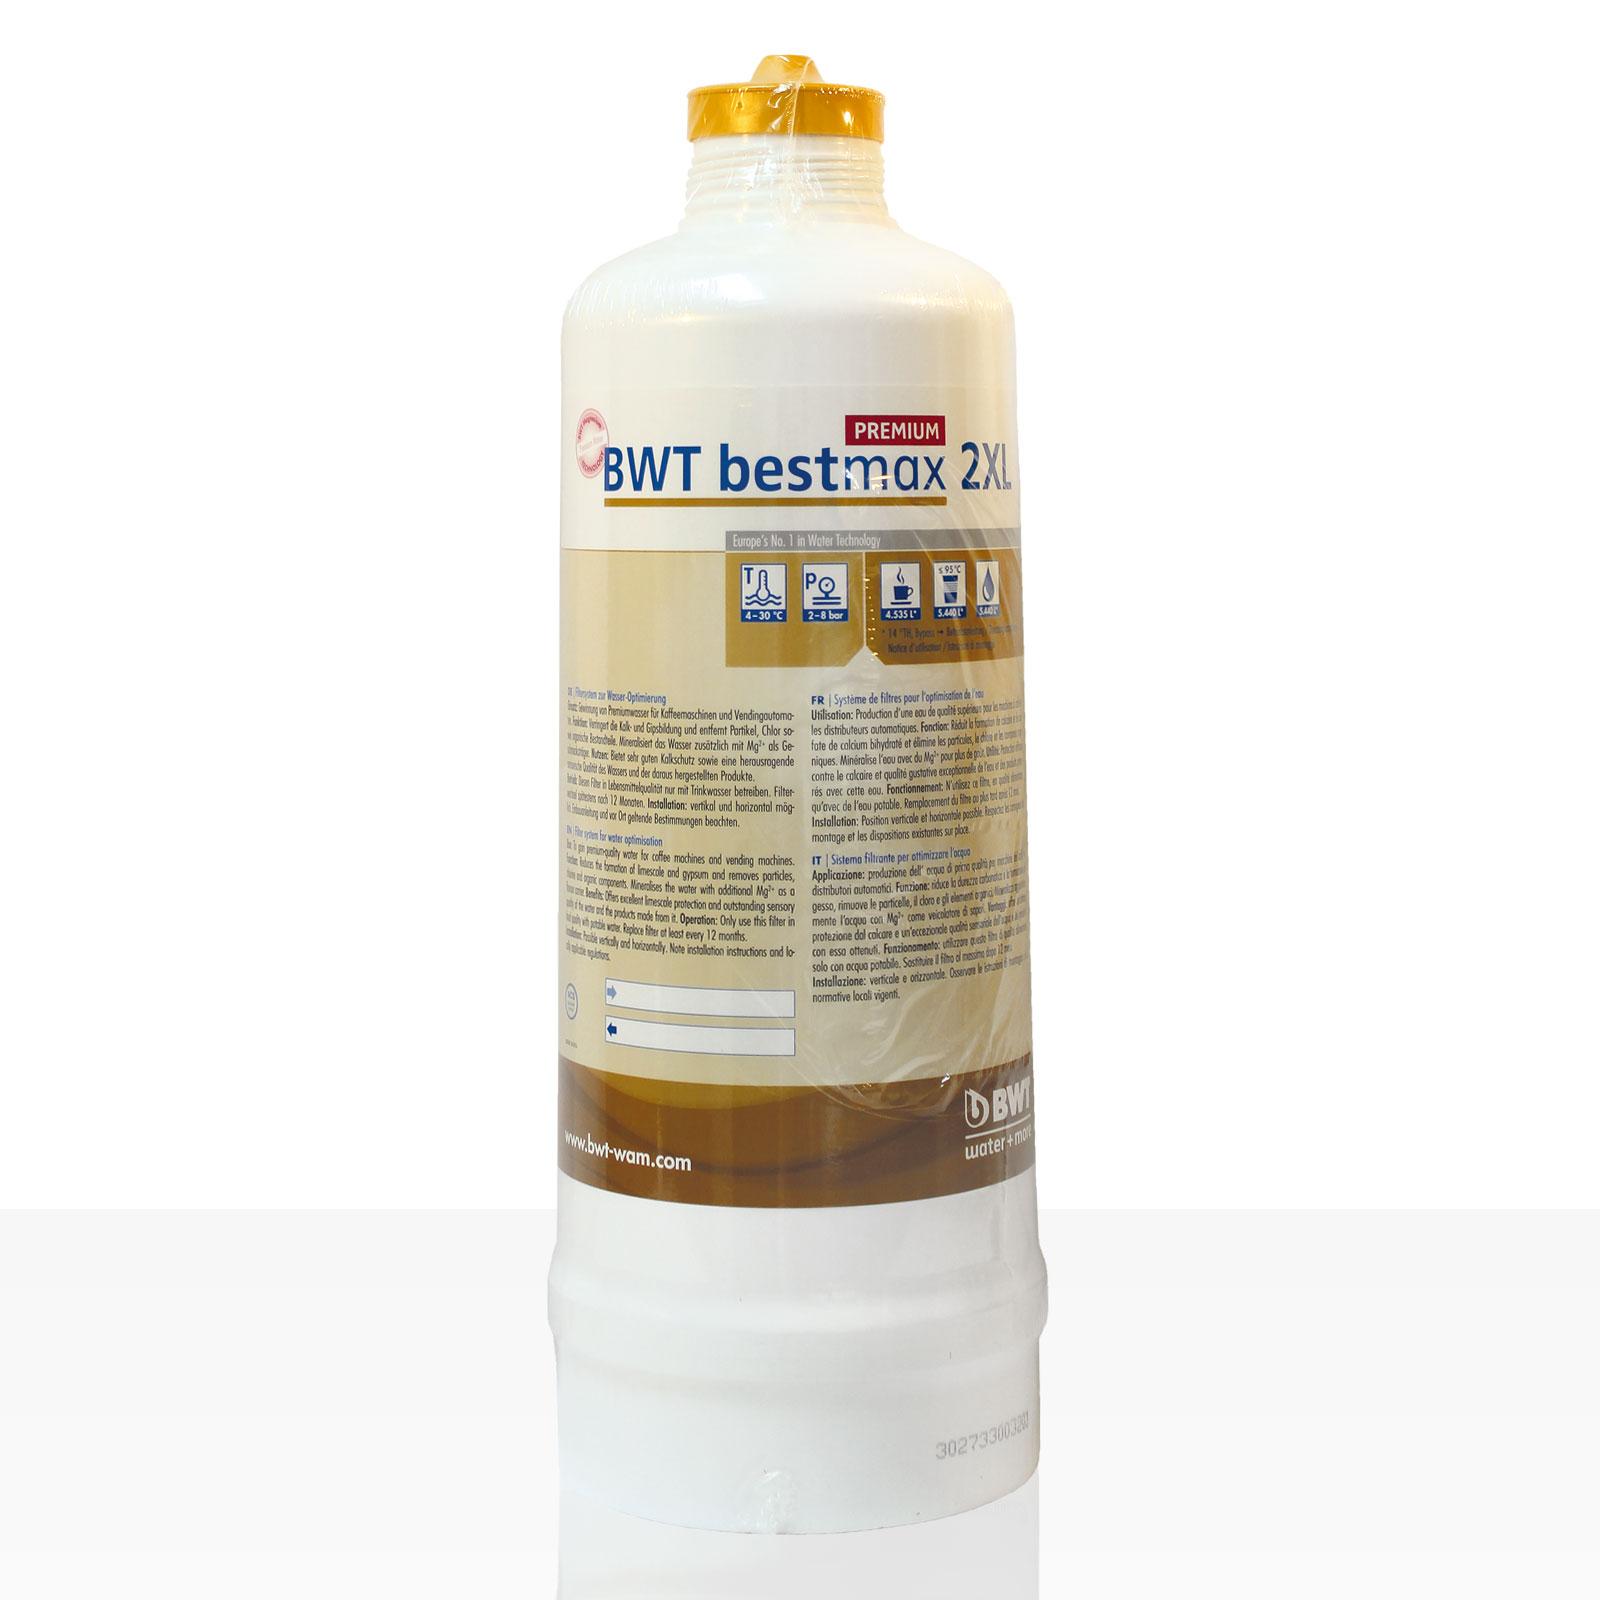 Bestmax 2XL Premium Filterkerze, BWT water + more Wasserfilter, ca. 7000 L